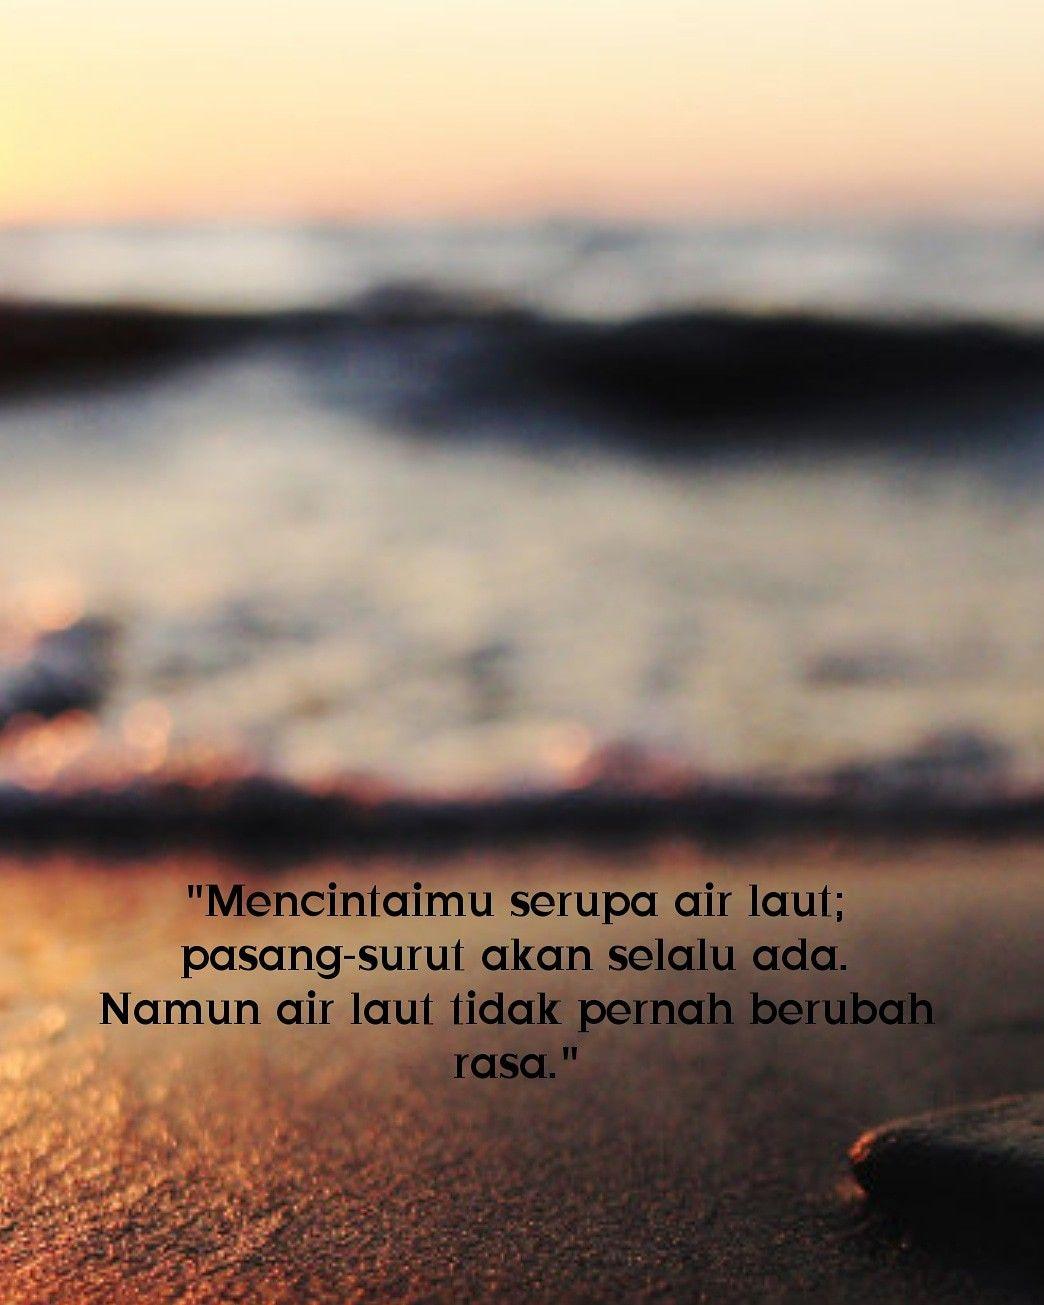 Mencintaimu Serupa Air Laut Pasang Surut Akan Selalu Ada Namun Air Laut Tidak Pernah Berubah Rasa Lautan Air Kata Kata Mutiara